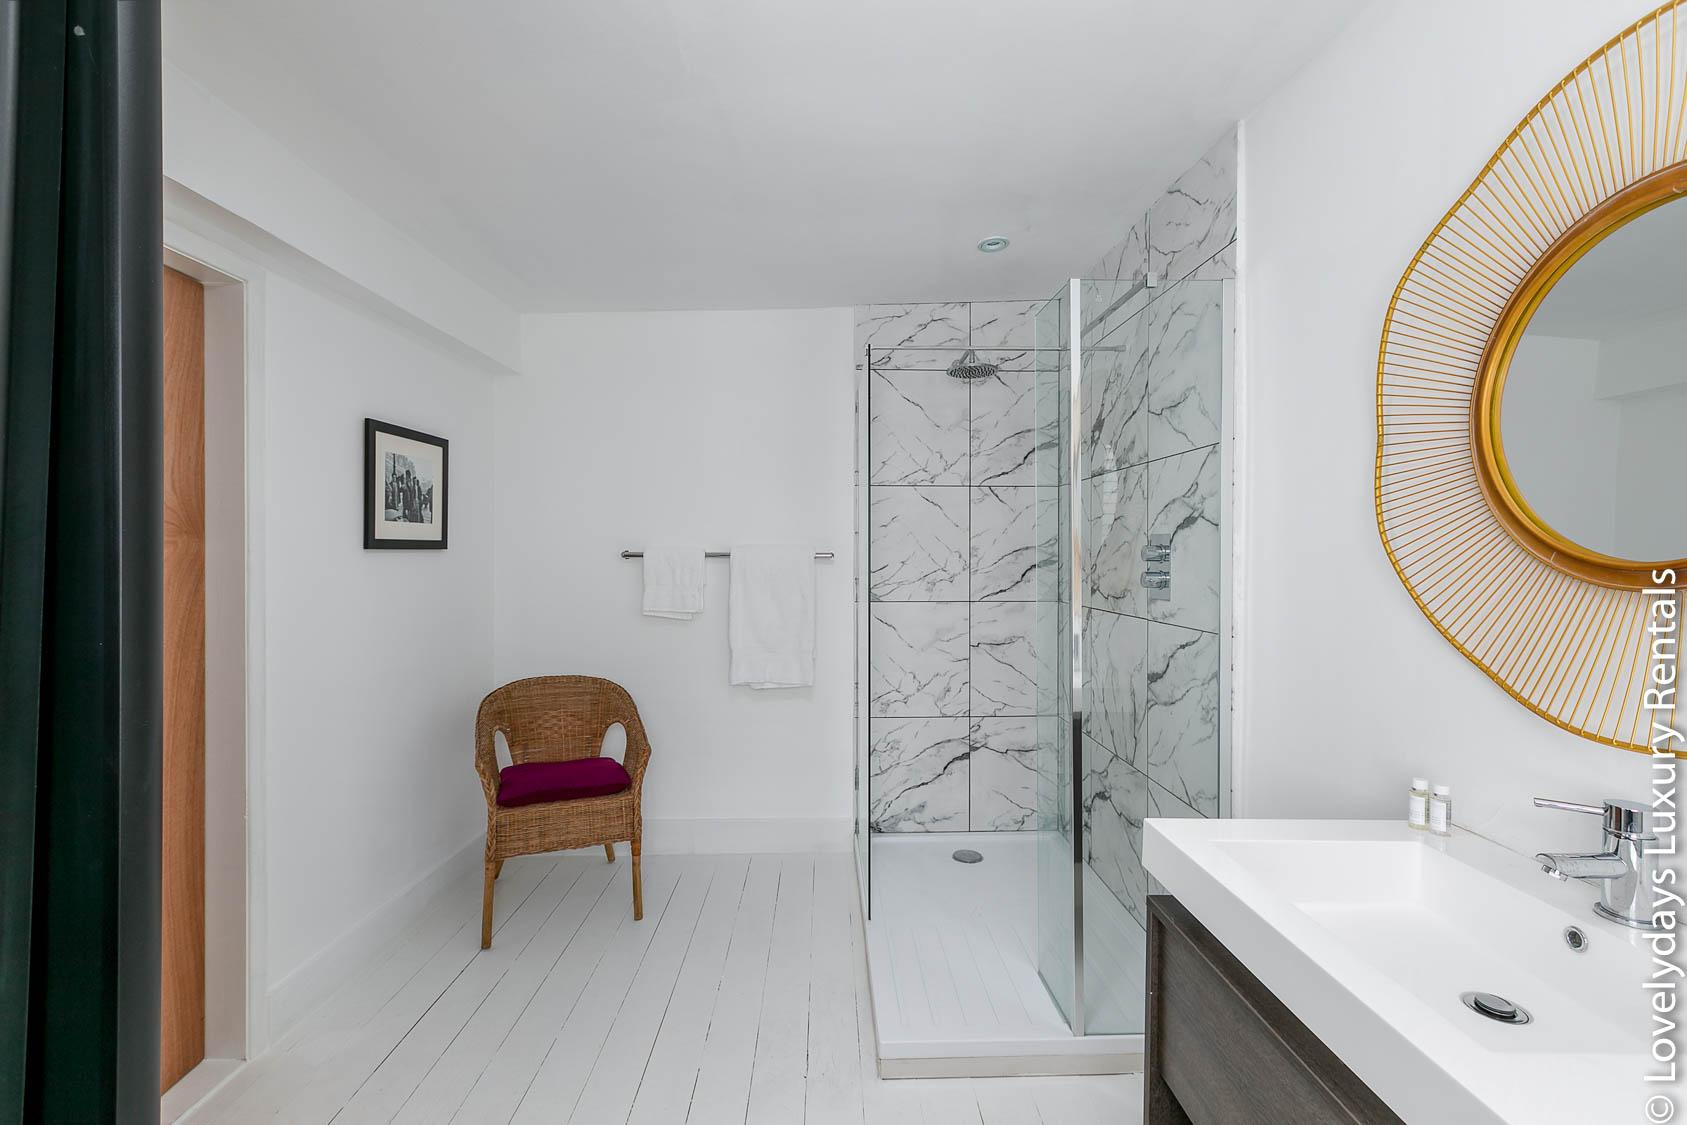 Lovelydays luxury service apartment rental - London - Fitzrovia - Goodge 55 - Lovelysuite - 2 bedrooms - 3 bathrooms - Lovely shower - 2a23cefbb36e - Lovelydays